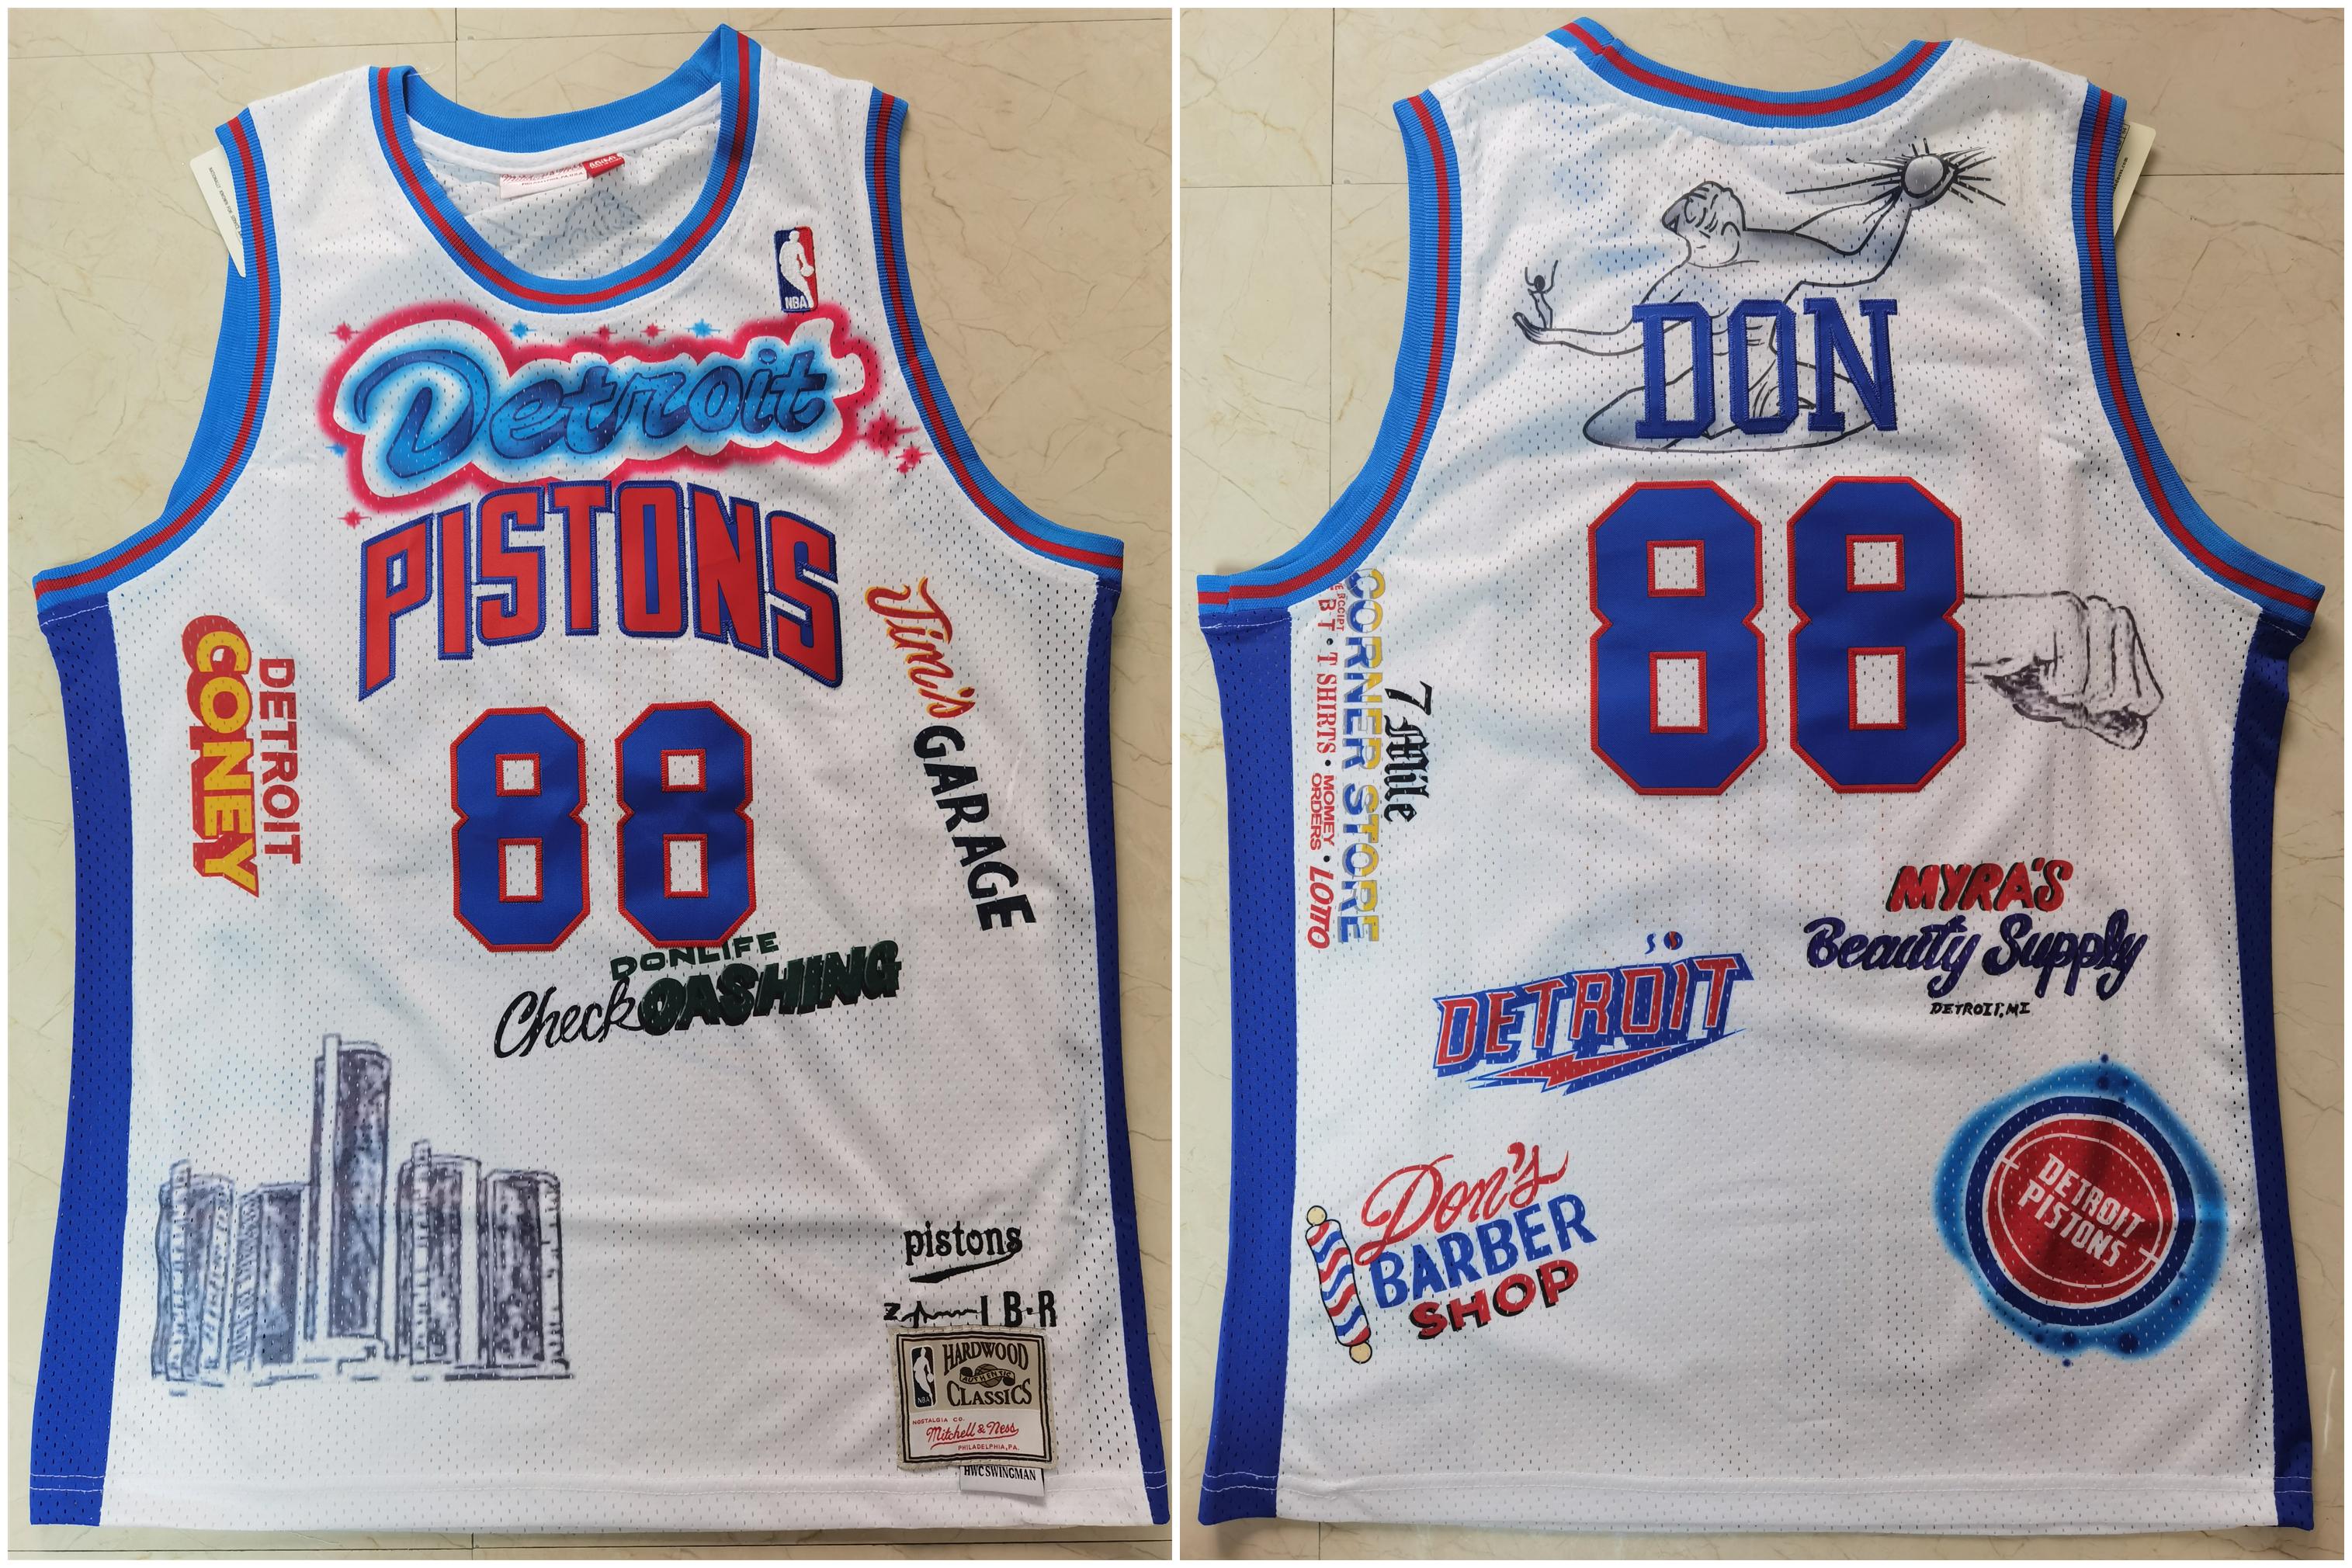 Pistons 88 Don White Hardwood Classics Jersey